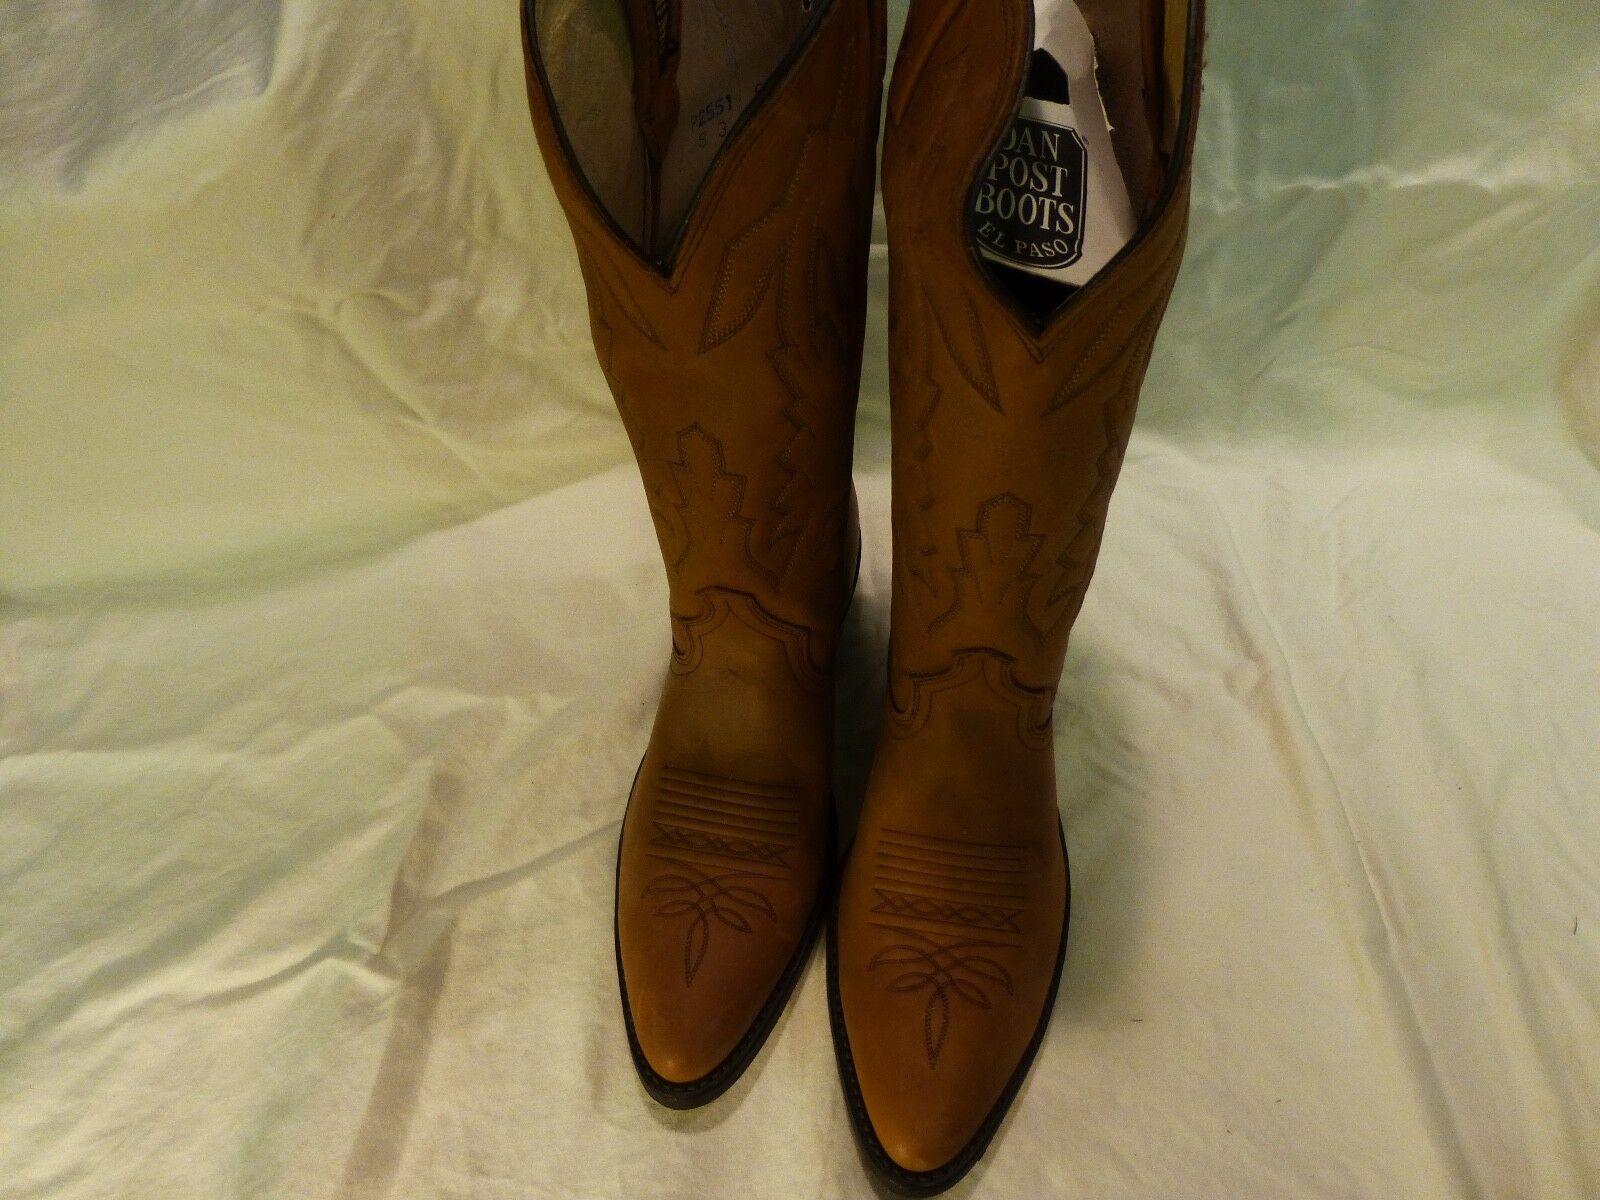 vendita scontata Dan Post Marlboro Western Leather Cowboy Cowboy Cowboy Casual Work Dress donna stivali 9.5D NEW  acquisto limitato